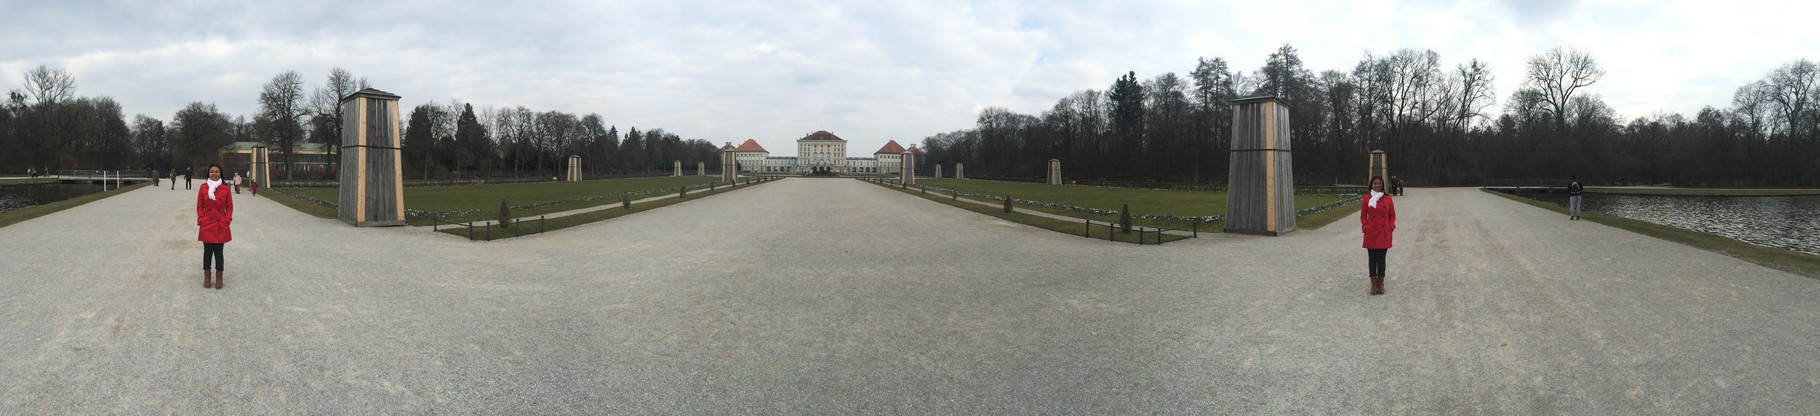 Twins? Parc of Nymphenburg Castle, Munich, Germany (March 2016)